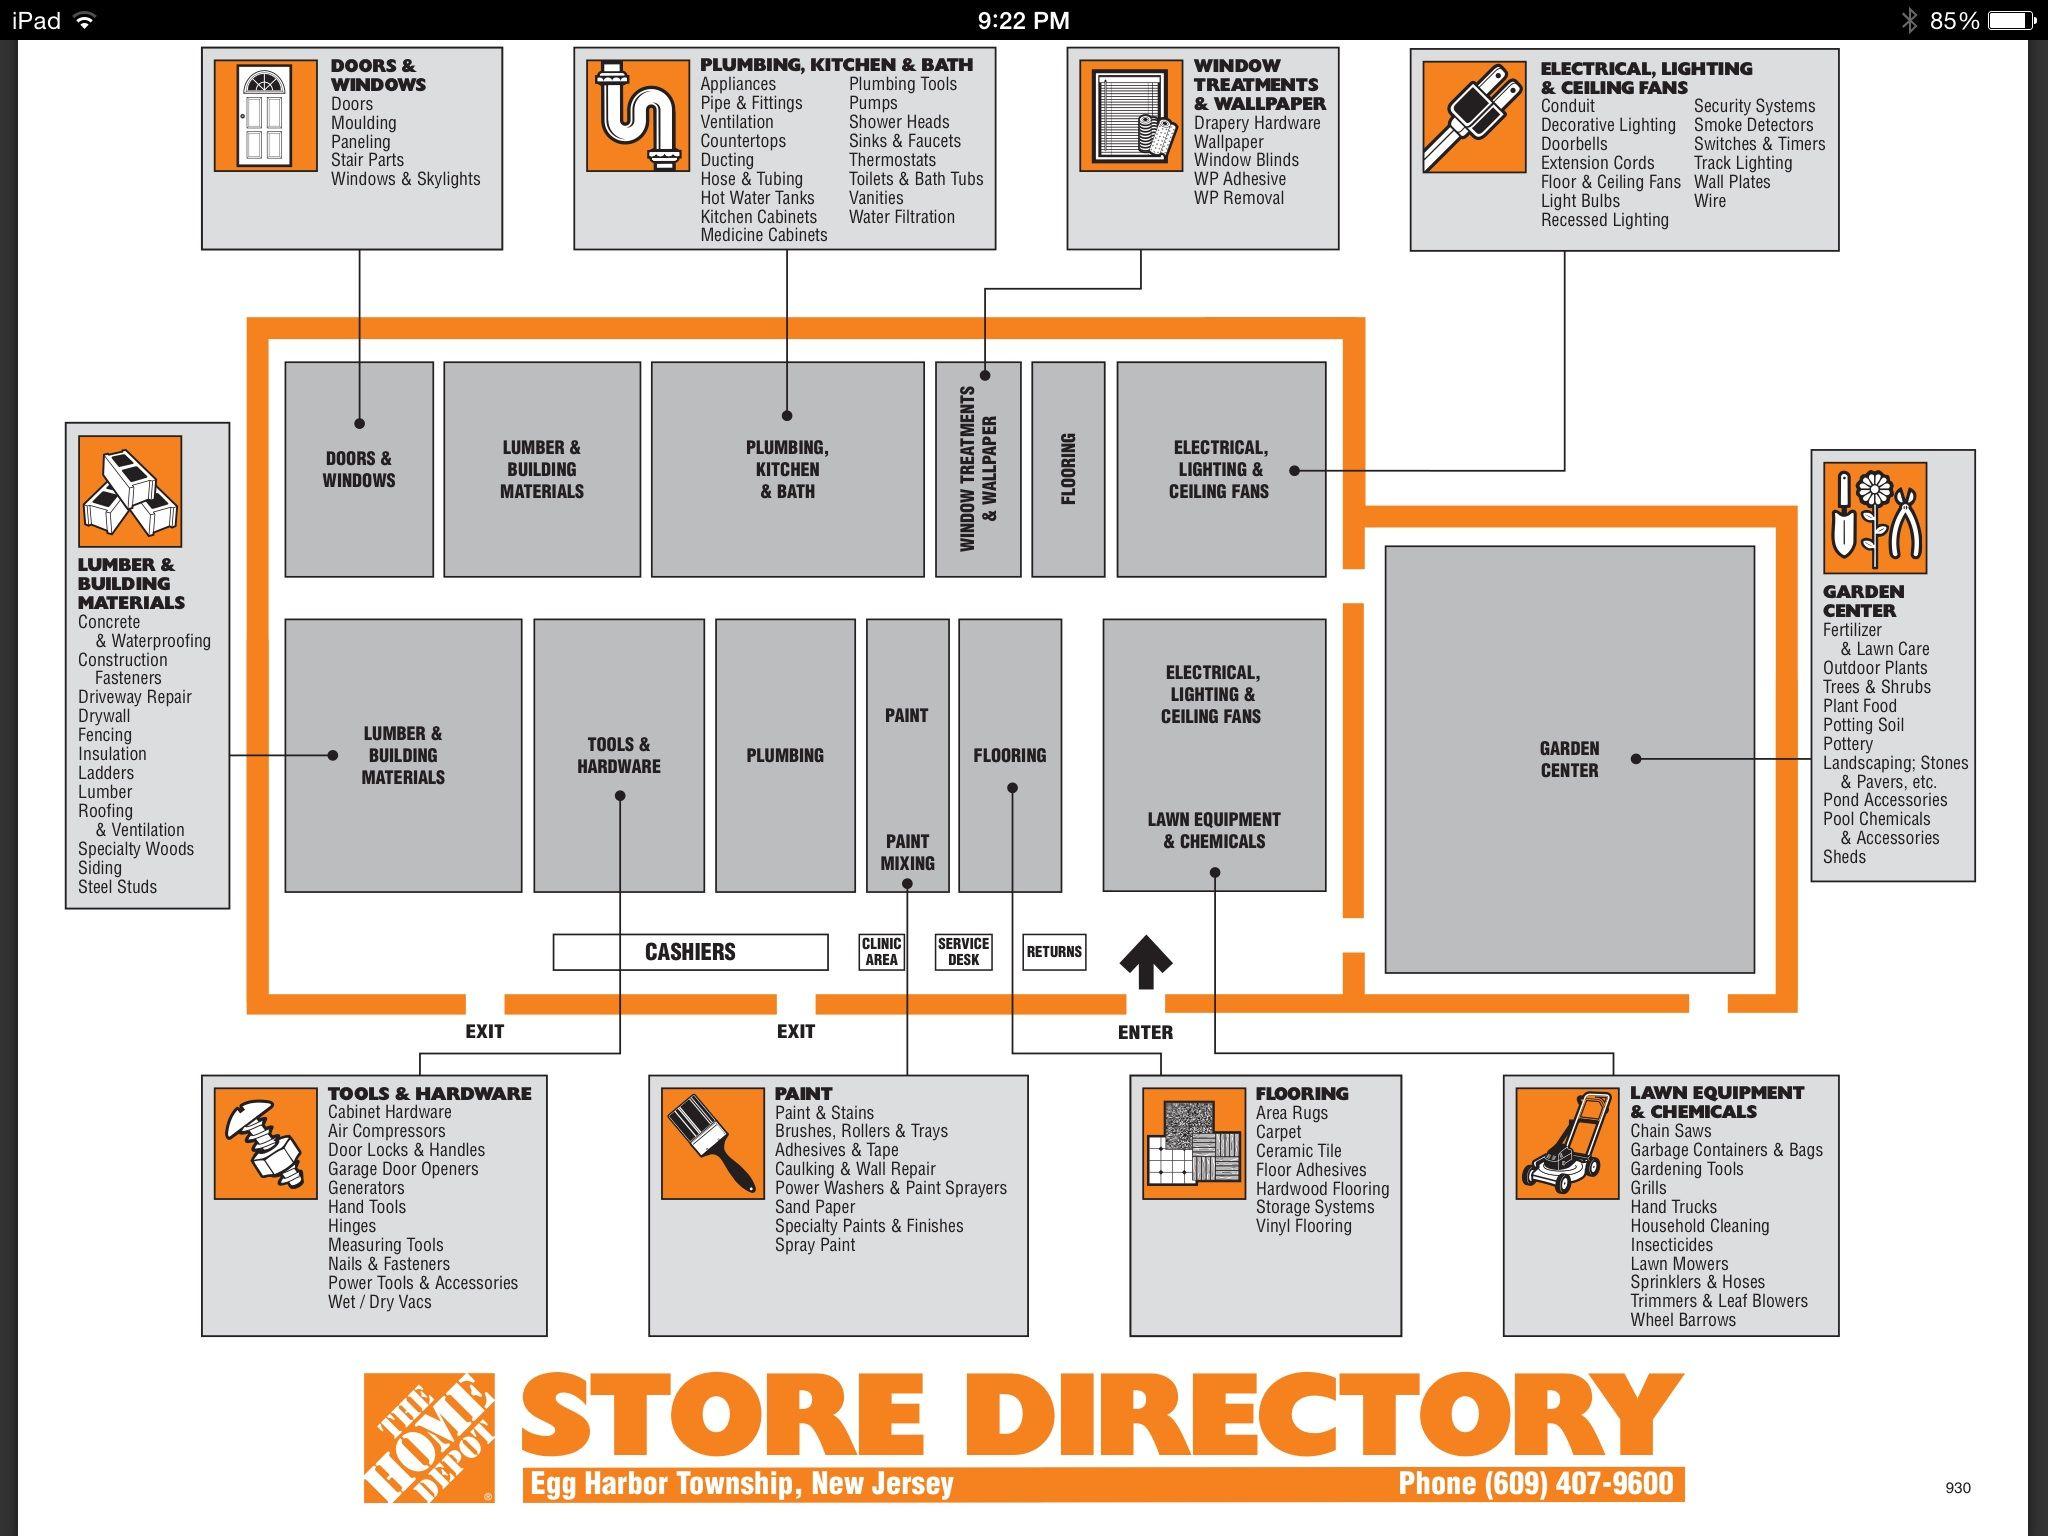 Home Depot Store Directory EHT NJ